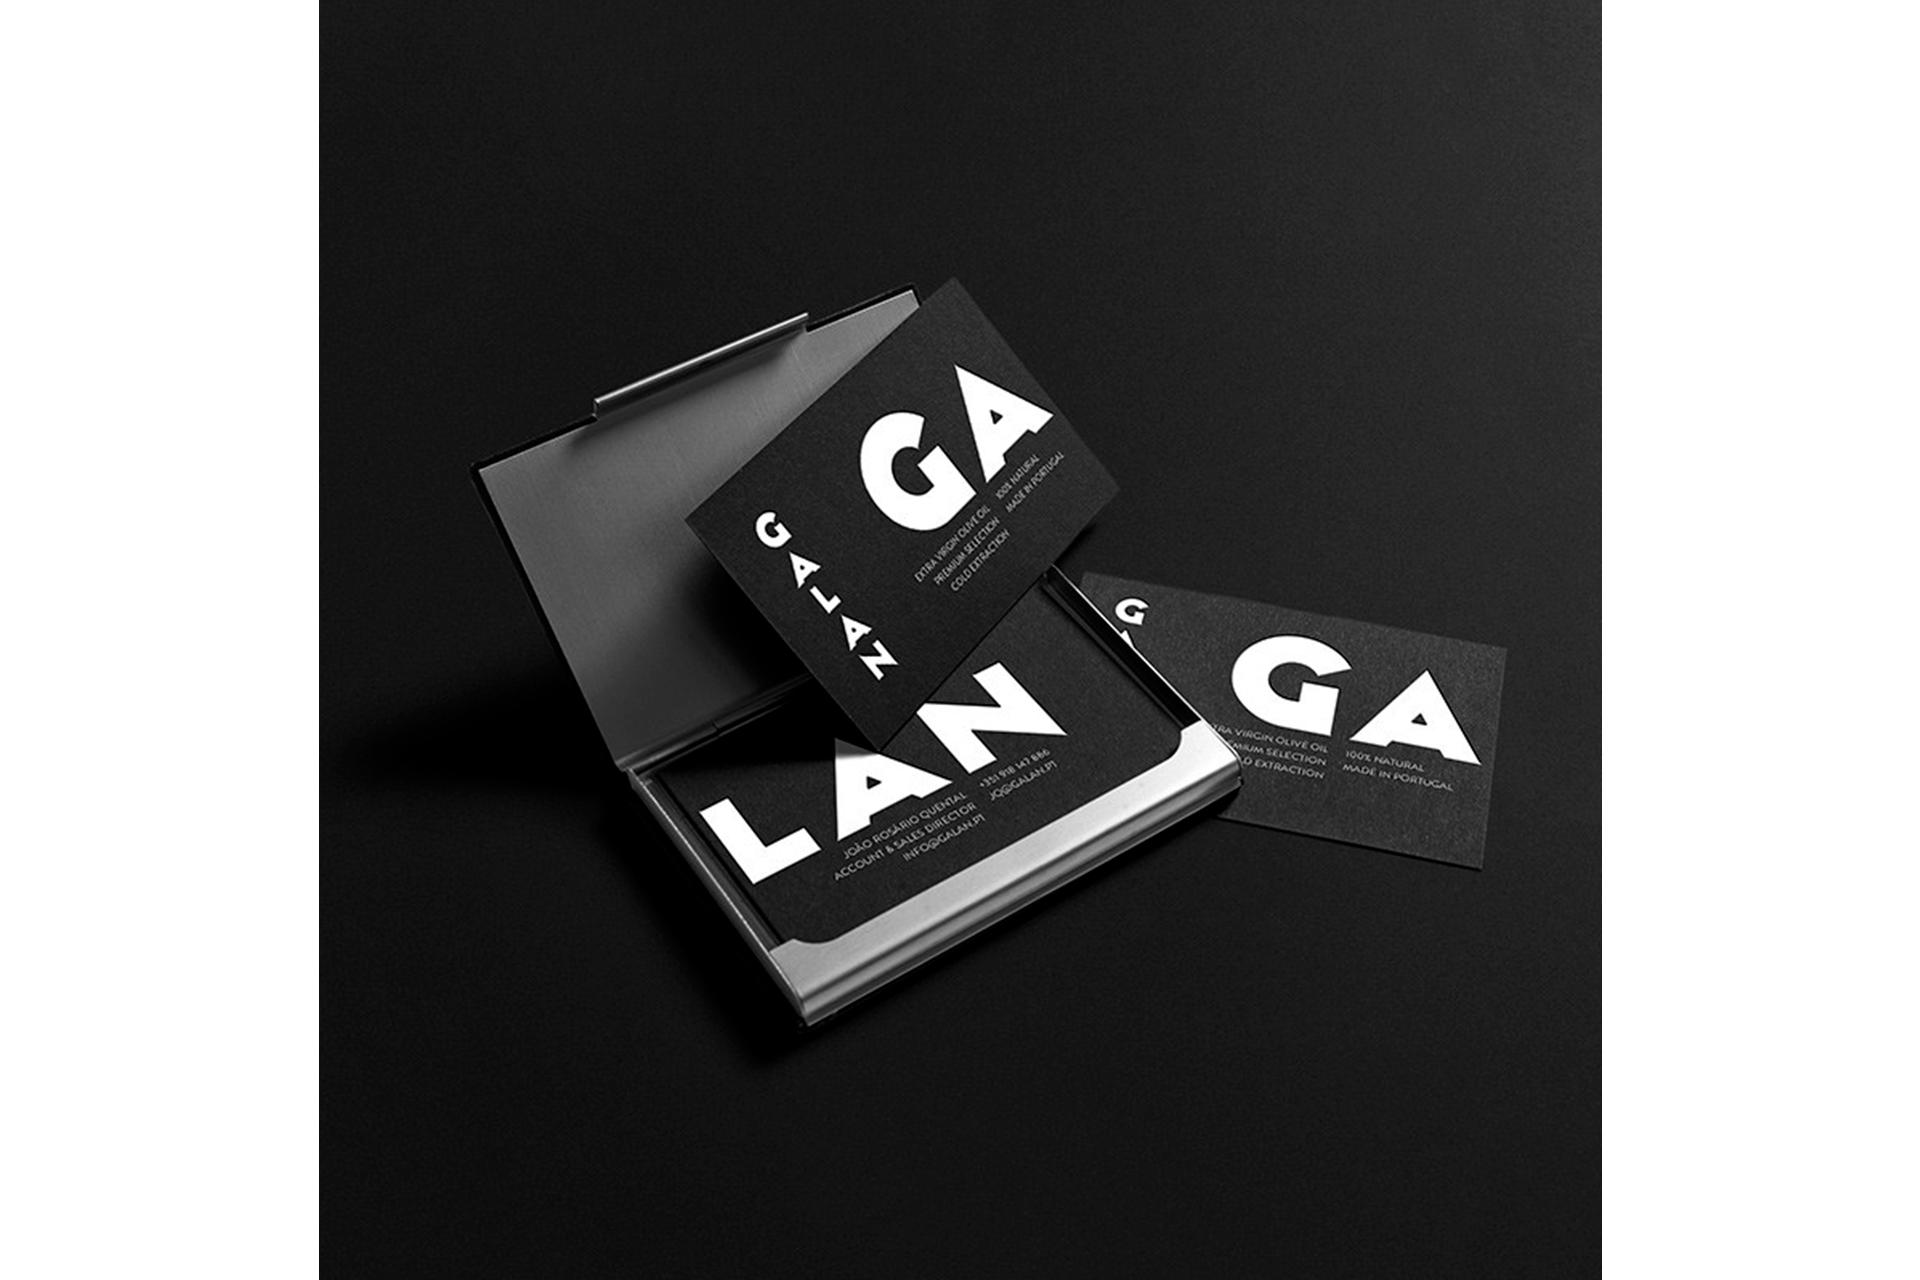 Galan- DESIGN BY MIGUEL SOEIRO